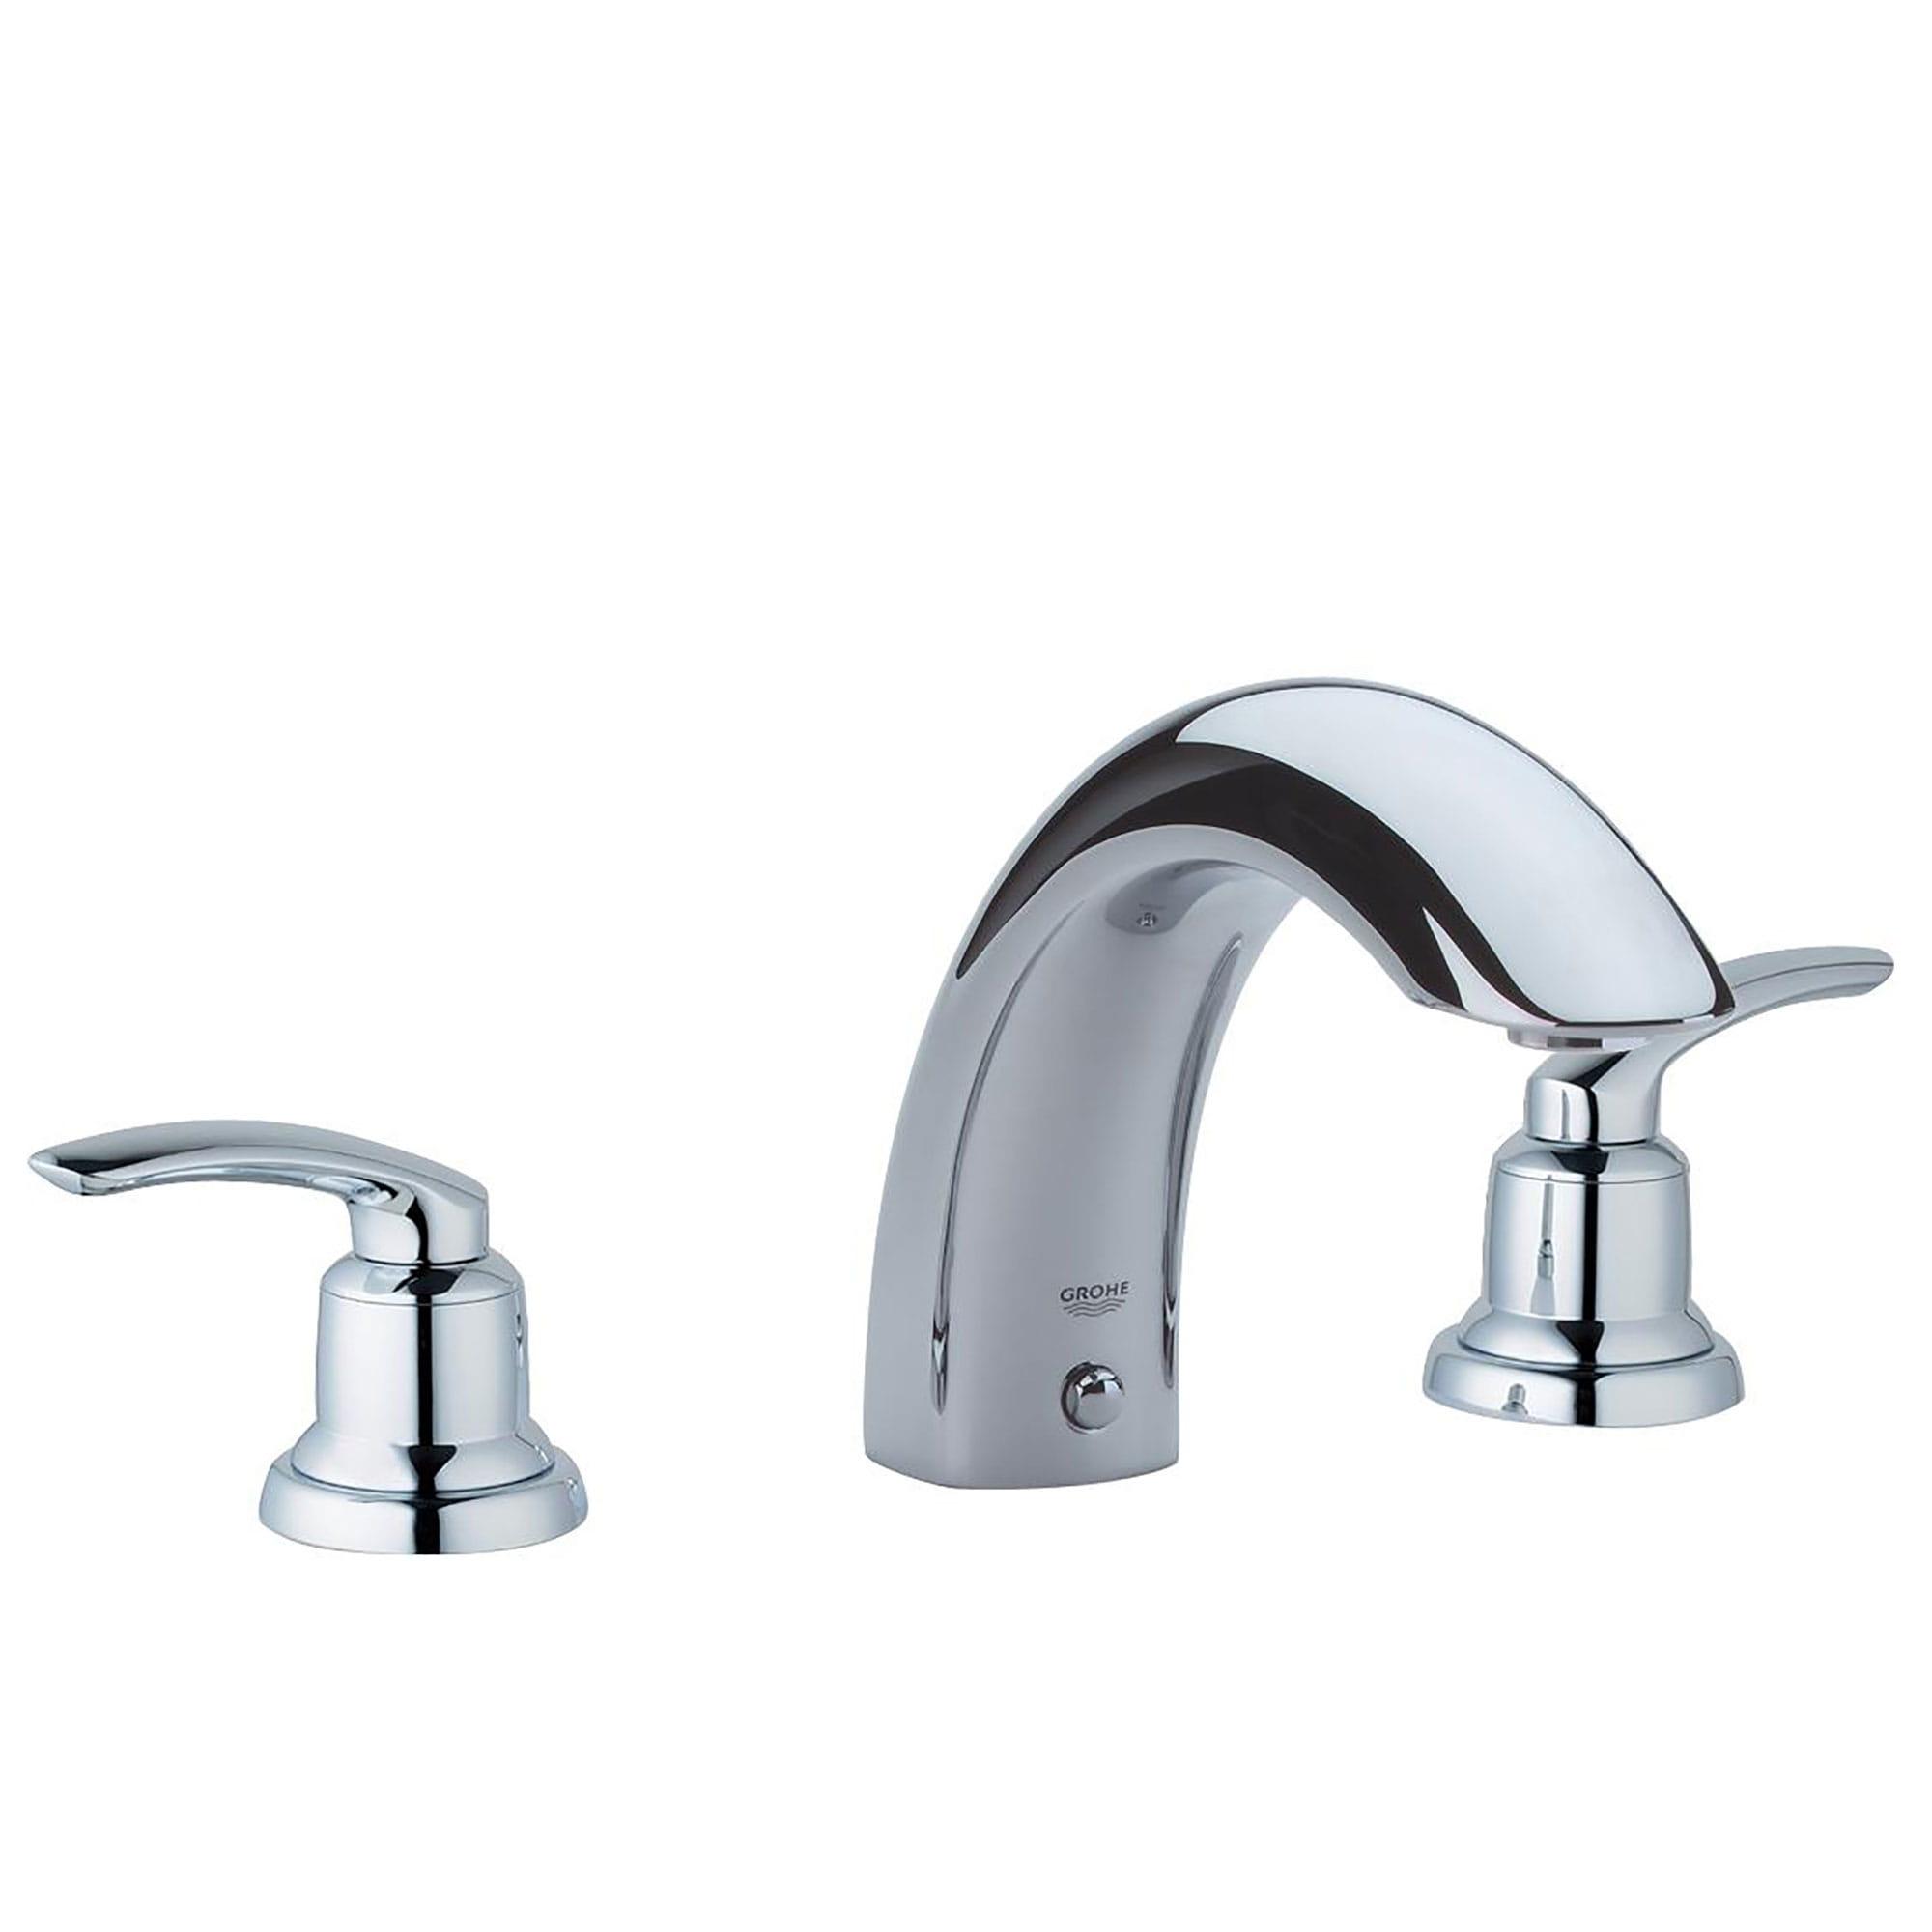 tree hole roman bathtub faucet